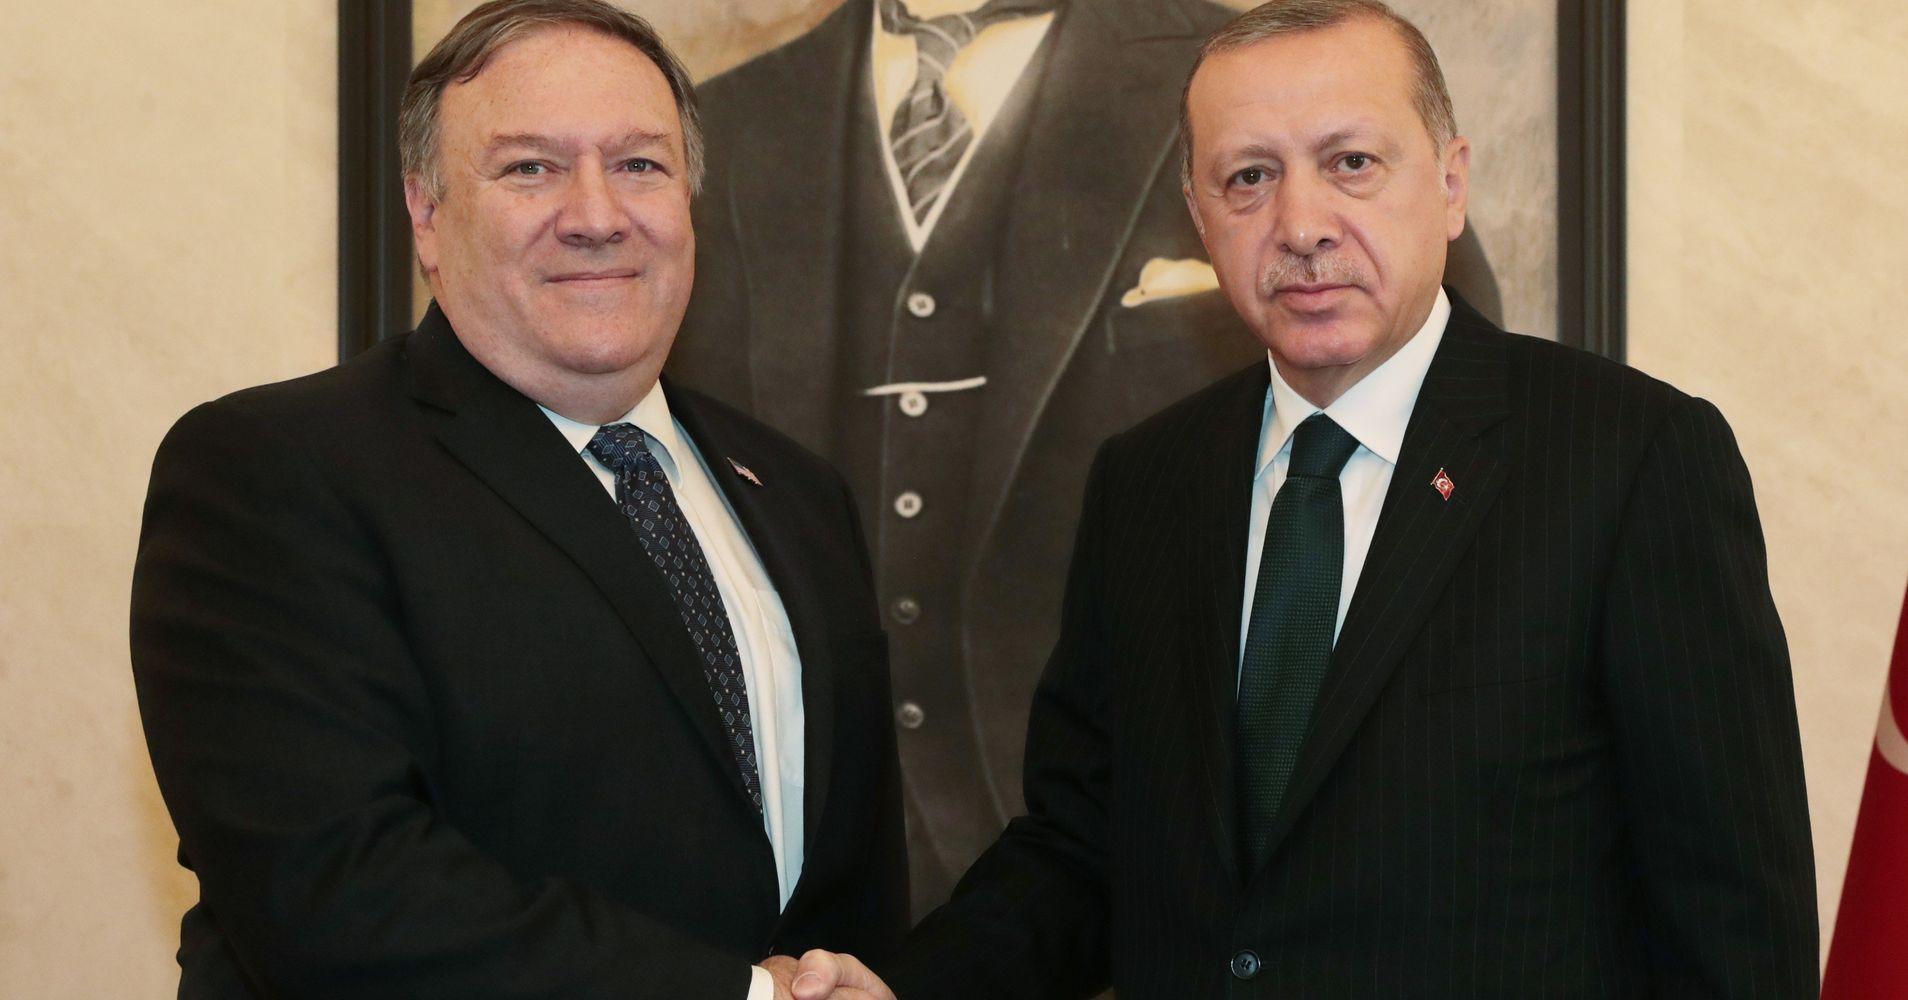 Pompeo Meets With Turkish President Erdogan To Discuss Khashoggi Disappearance